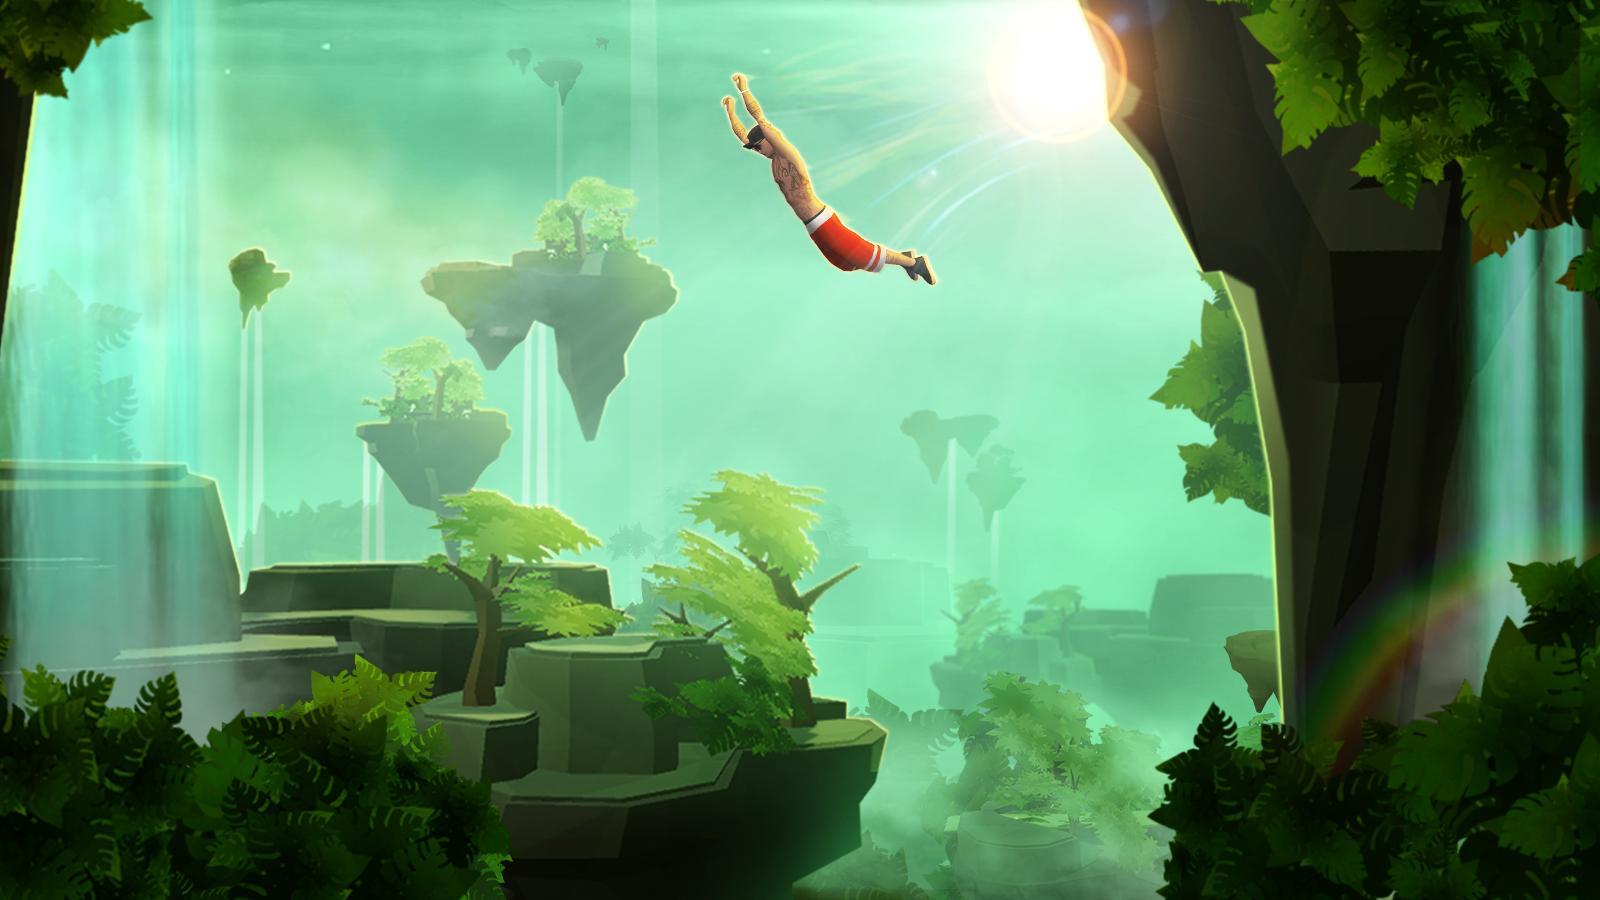 Sky Dancer Run - Running Game 4.2.0 Screenshot 4